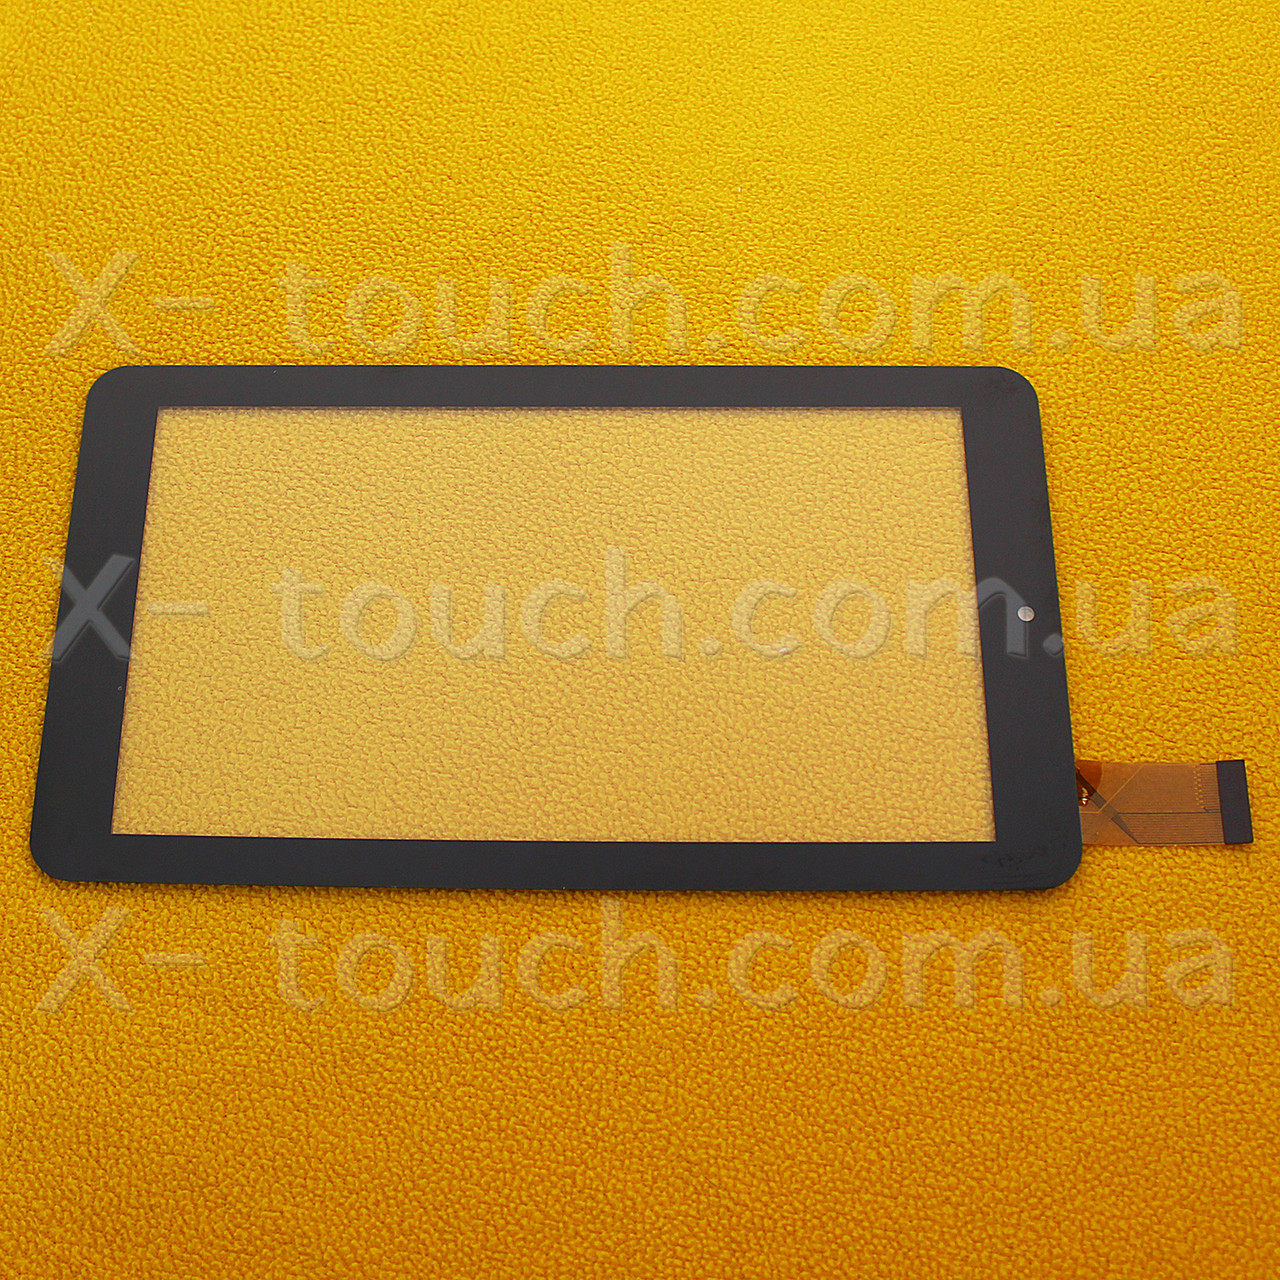 Тачскрин, сенсор  HS1285 V071  для планшета